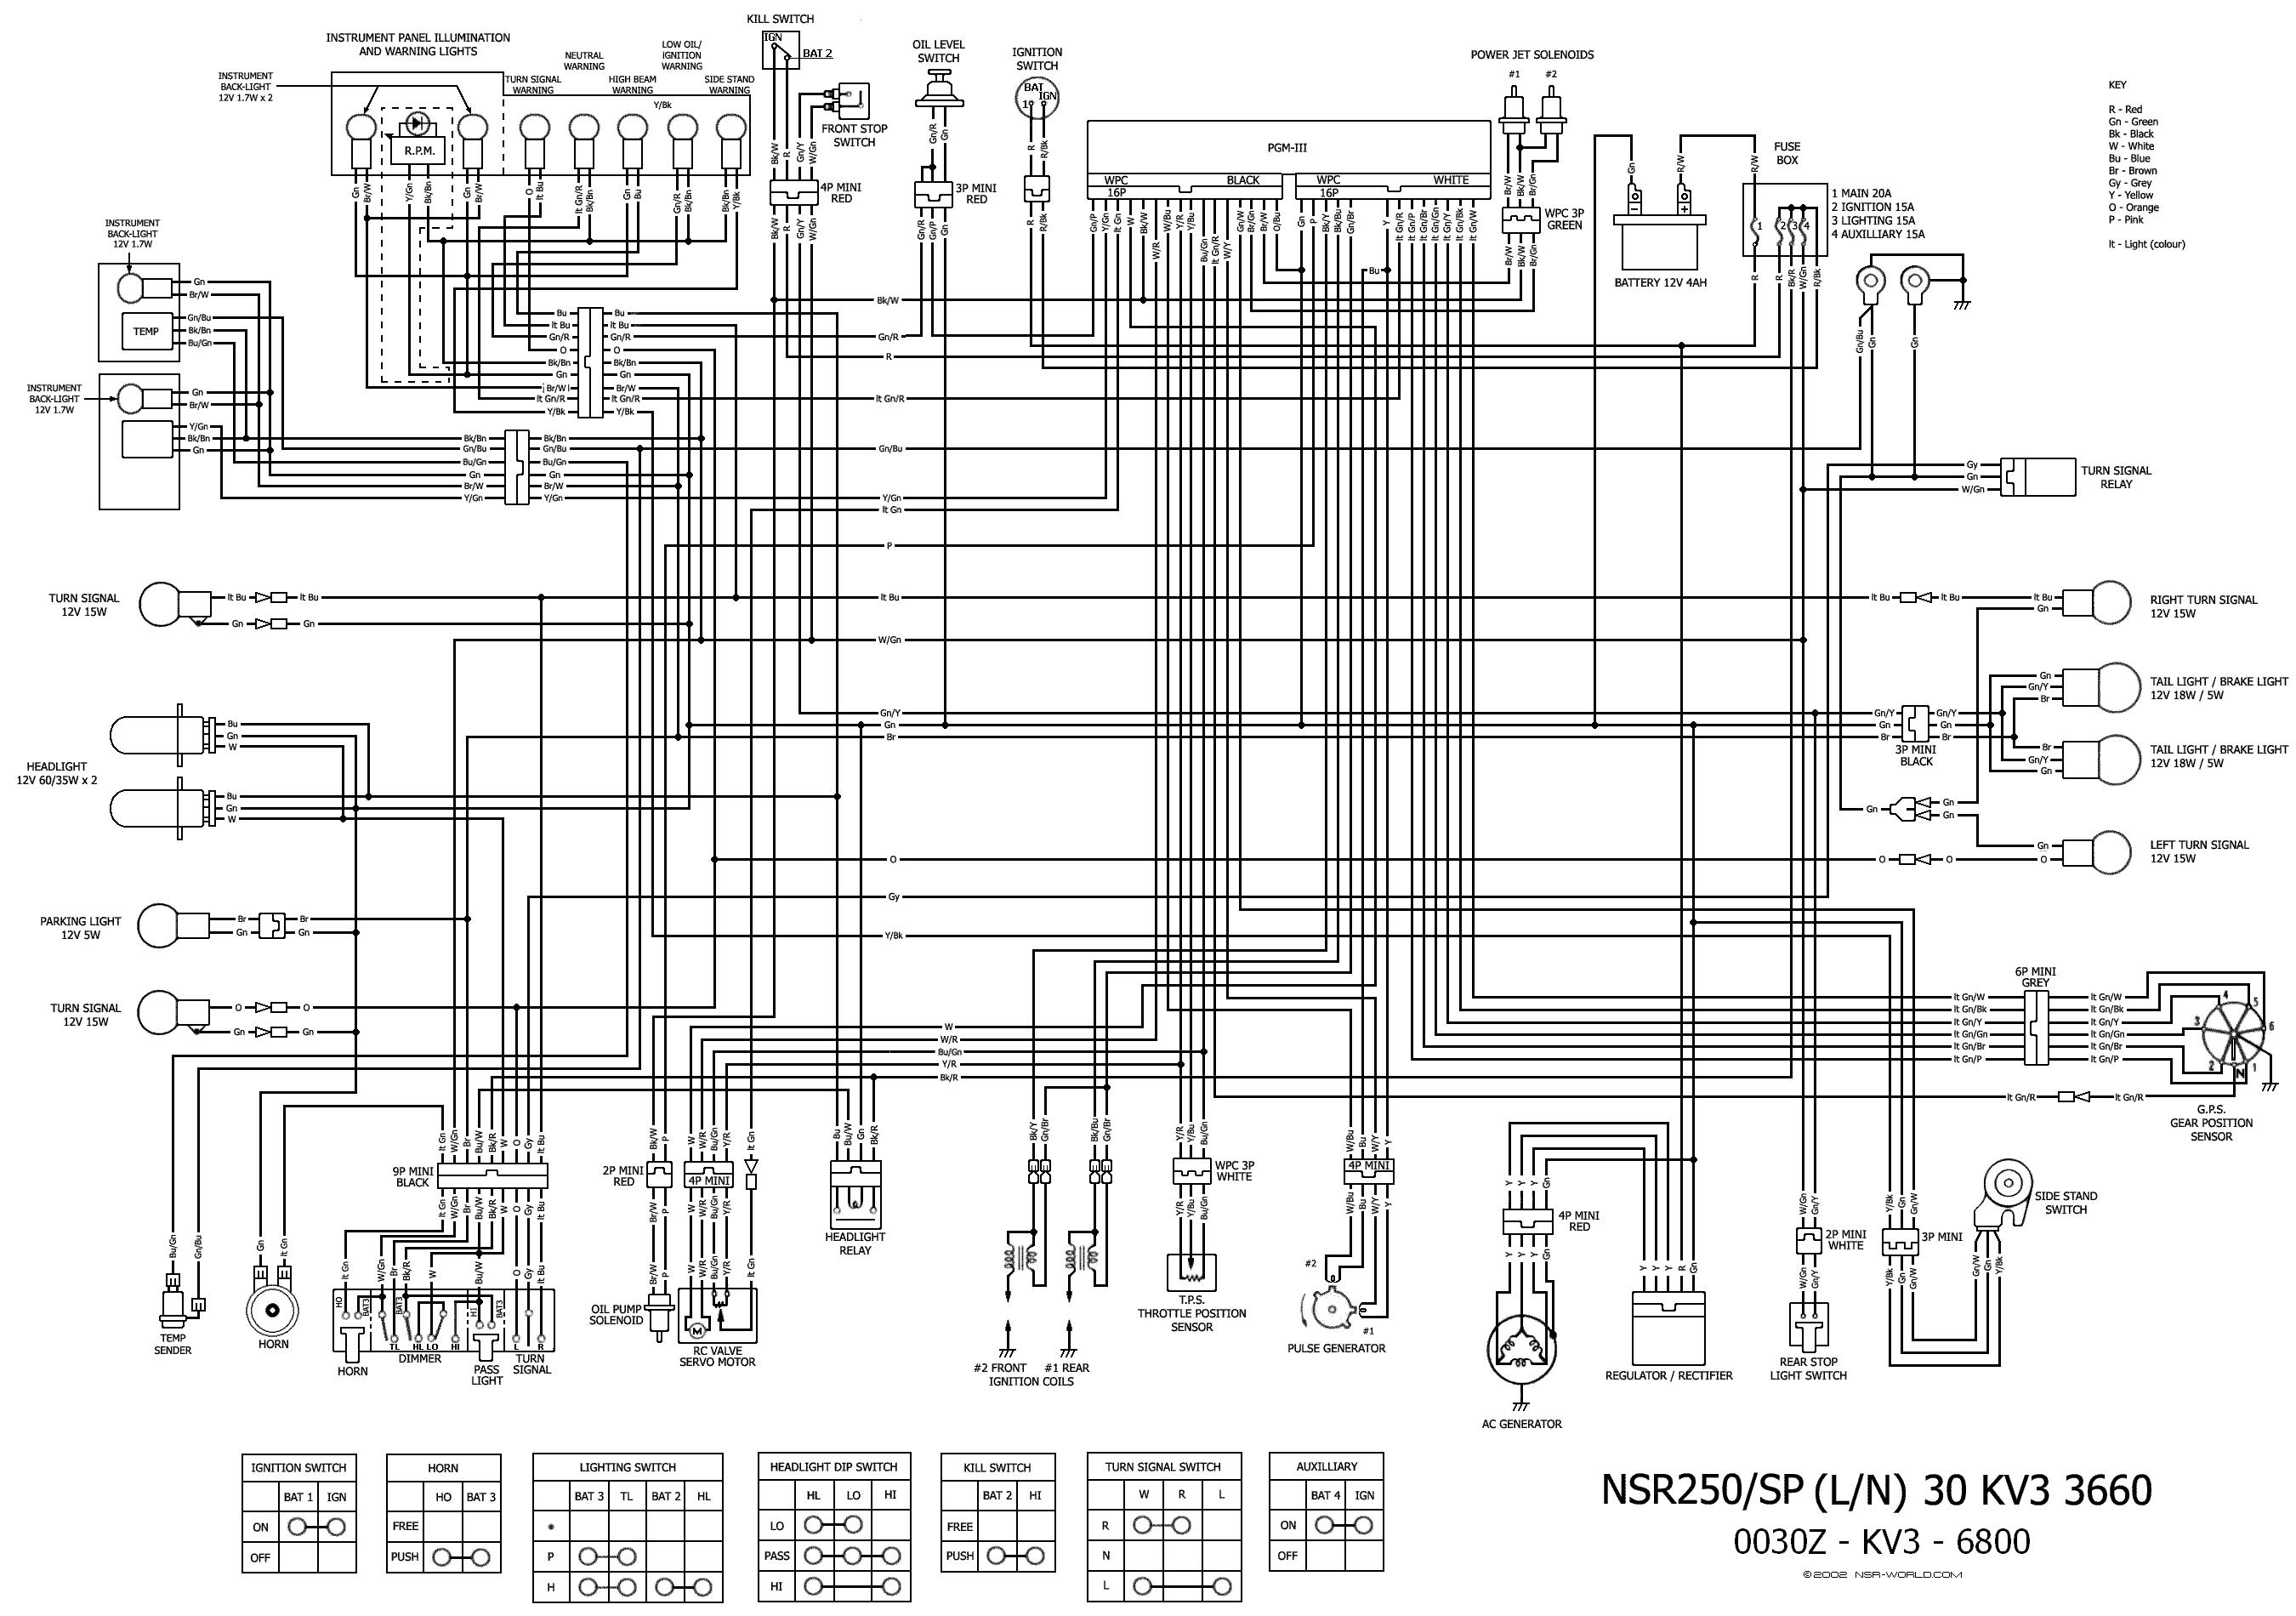 aprilia rs 125 wiring diagram 2006: charming aprilia rs 125 wiring diagram  images - electrical